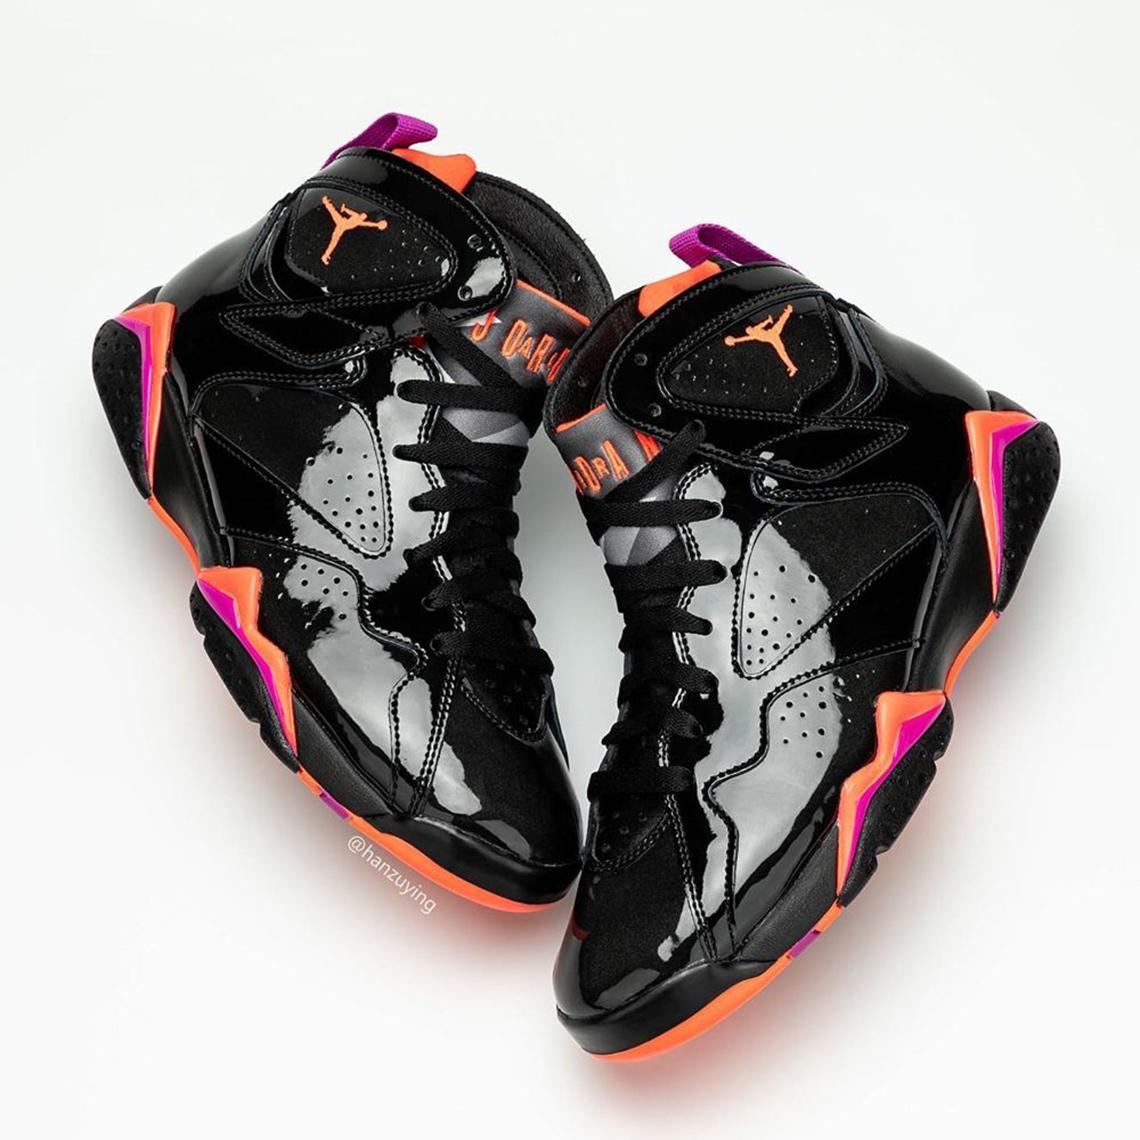 Jordan 7 Patent Leather 313358-006